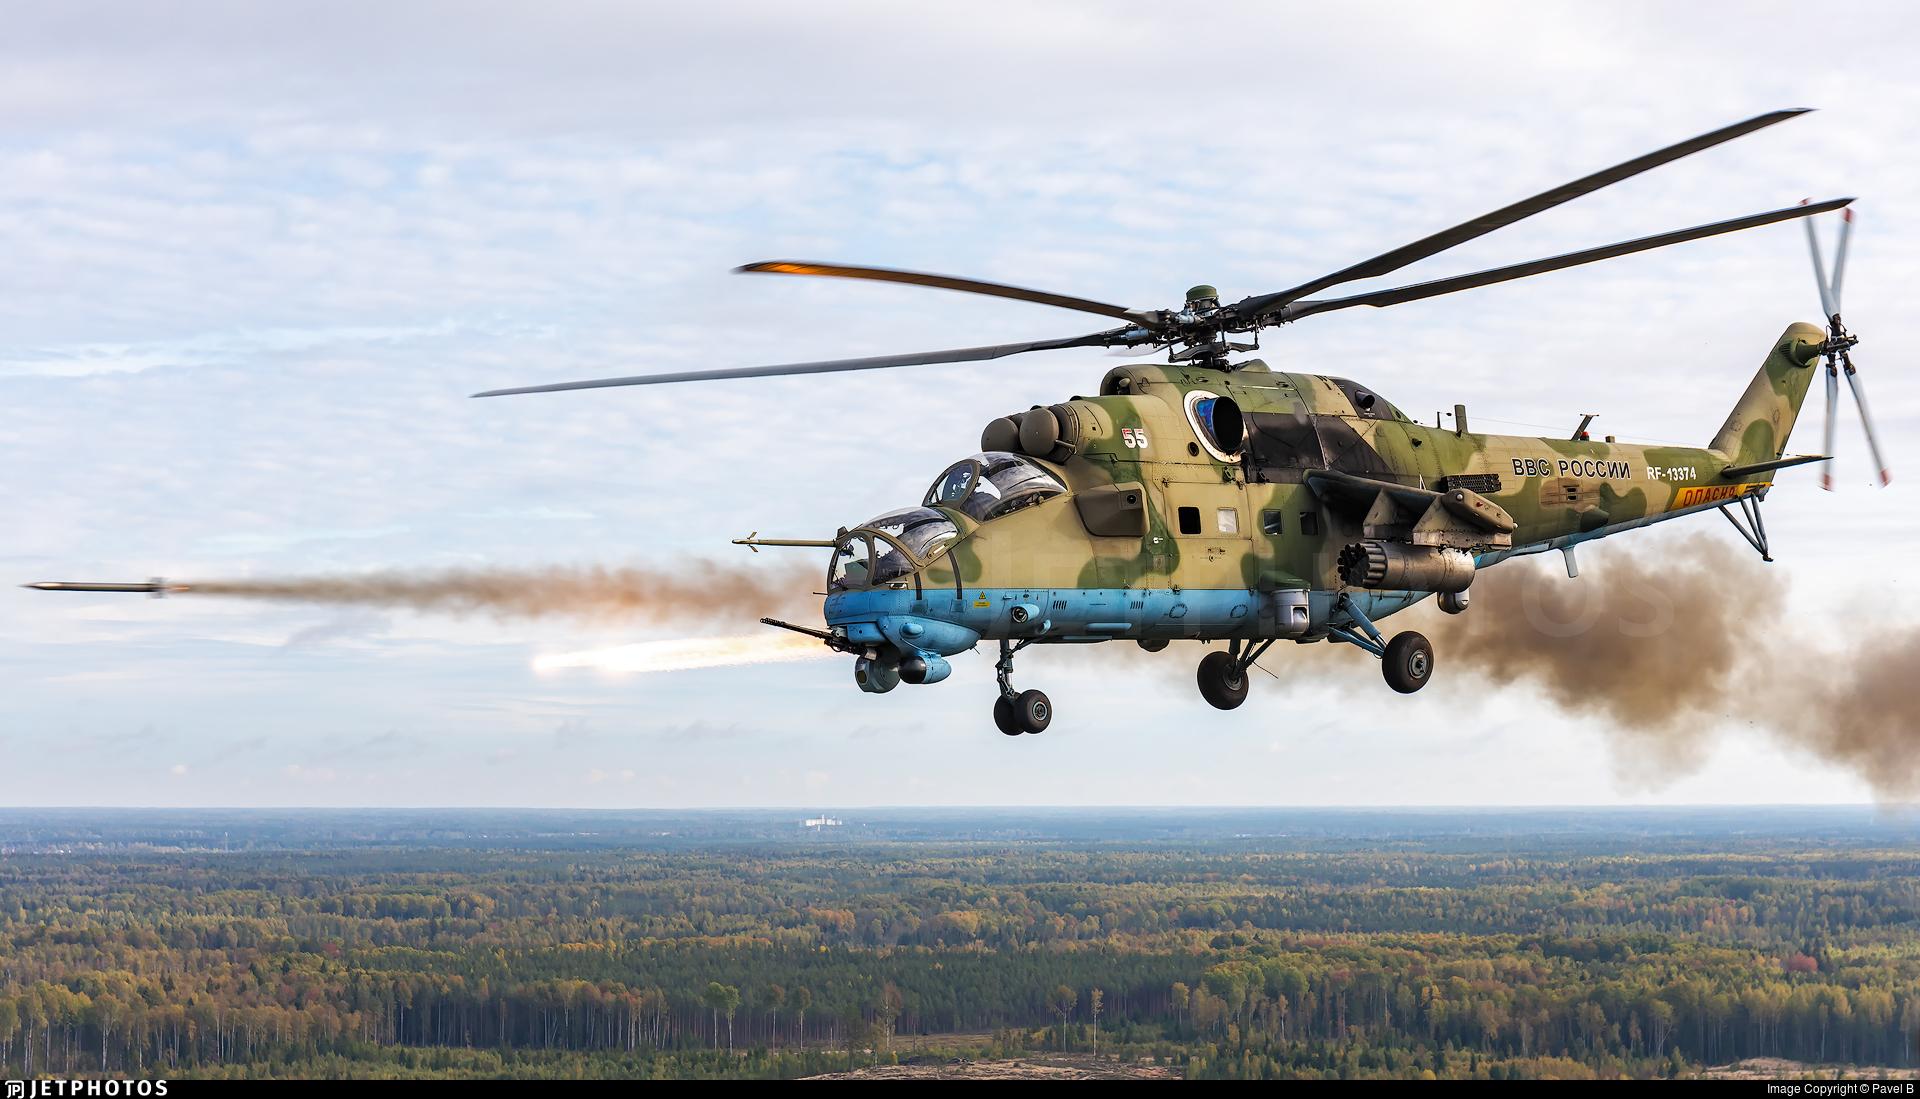 RF-13374 - Mil Mi-35M Hind - Russia - Air Force